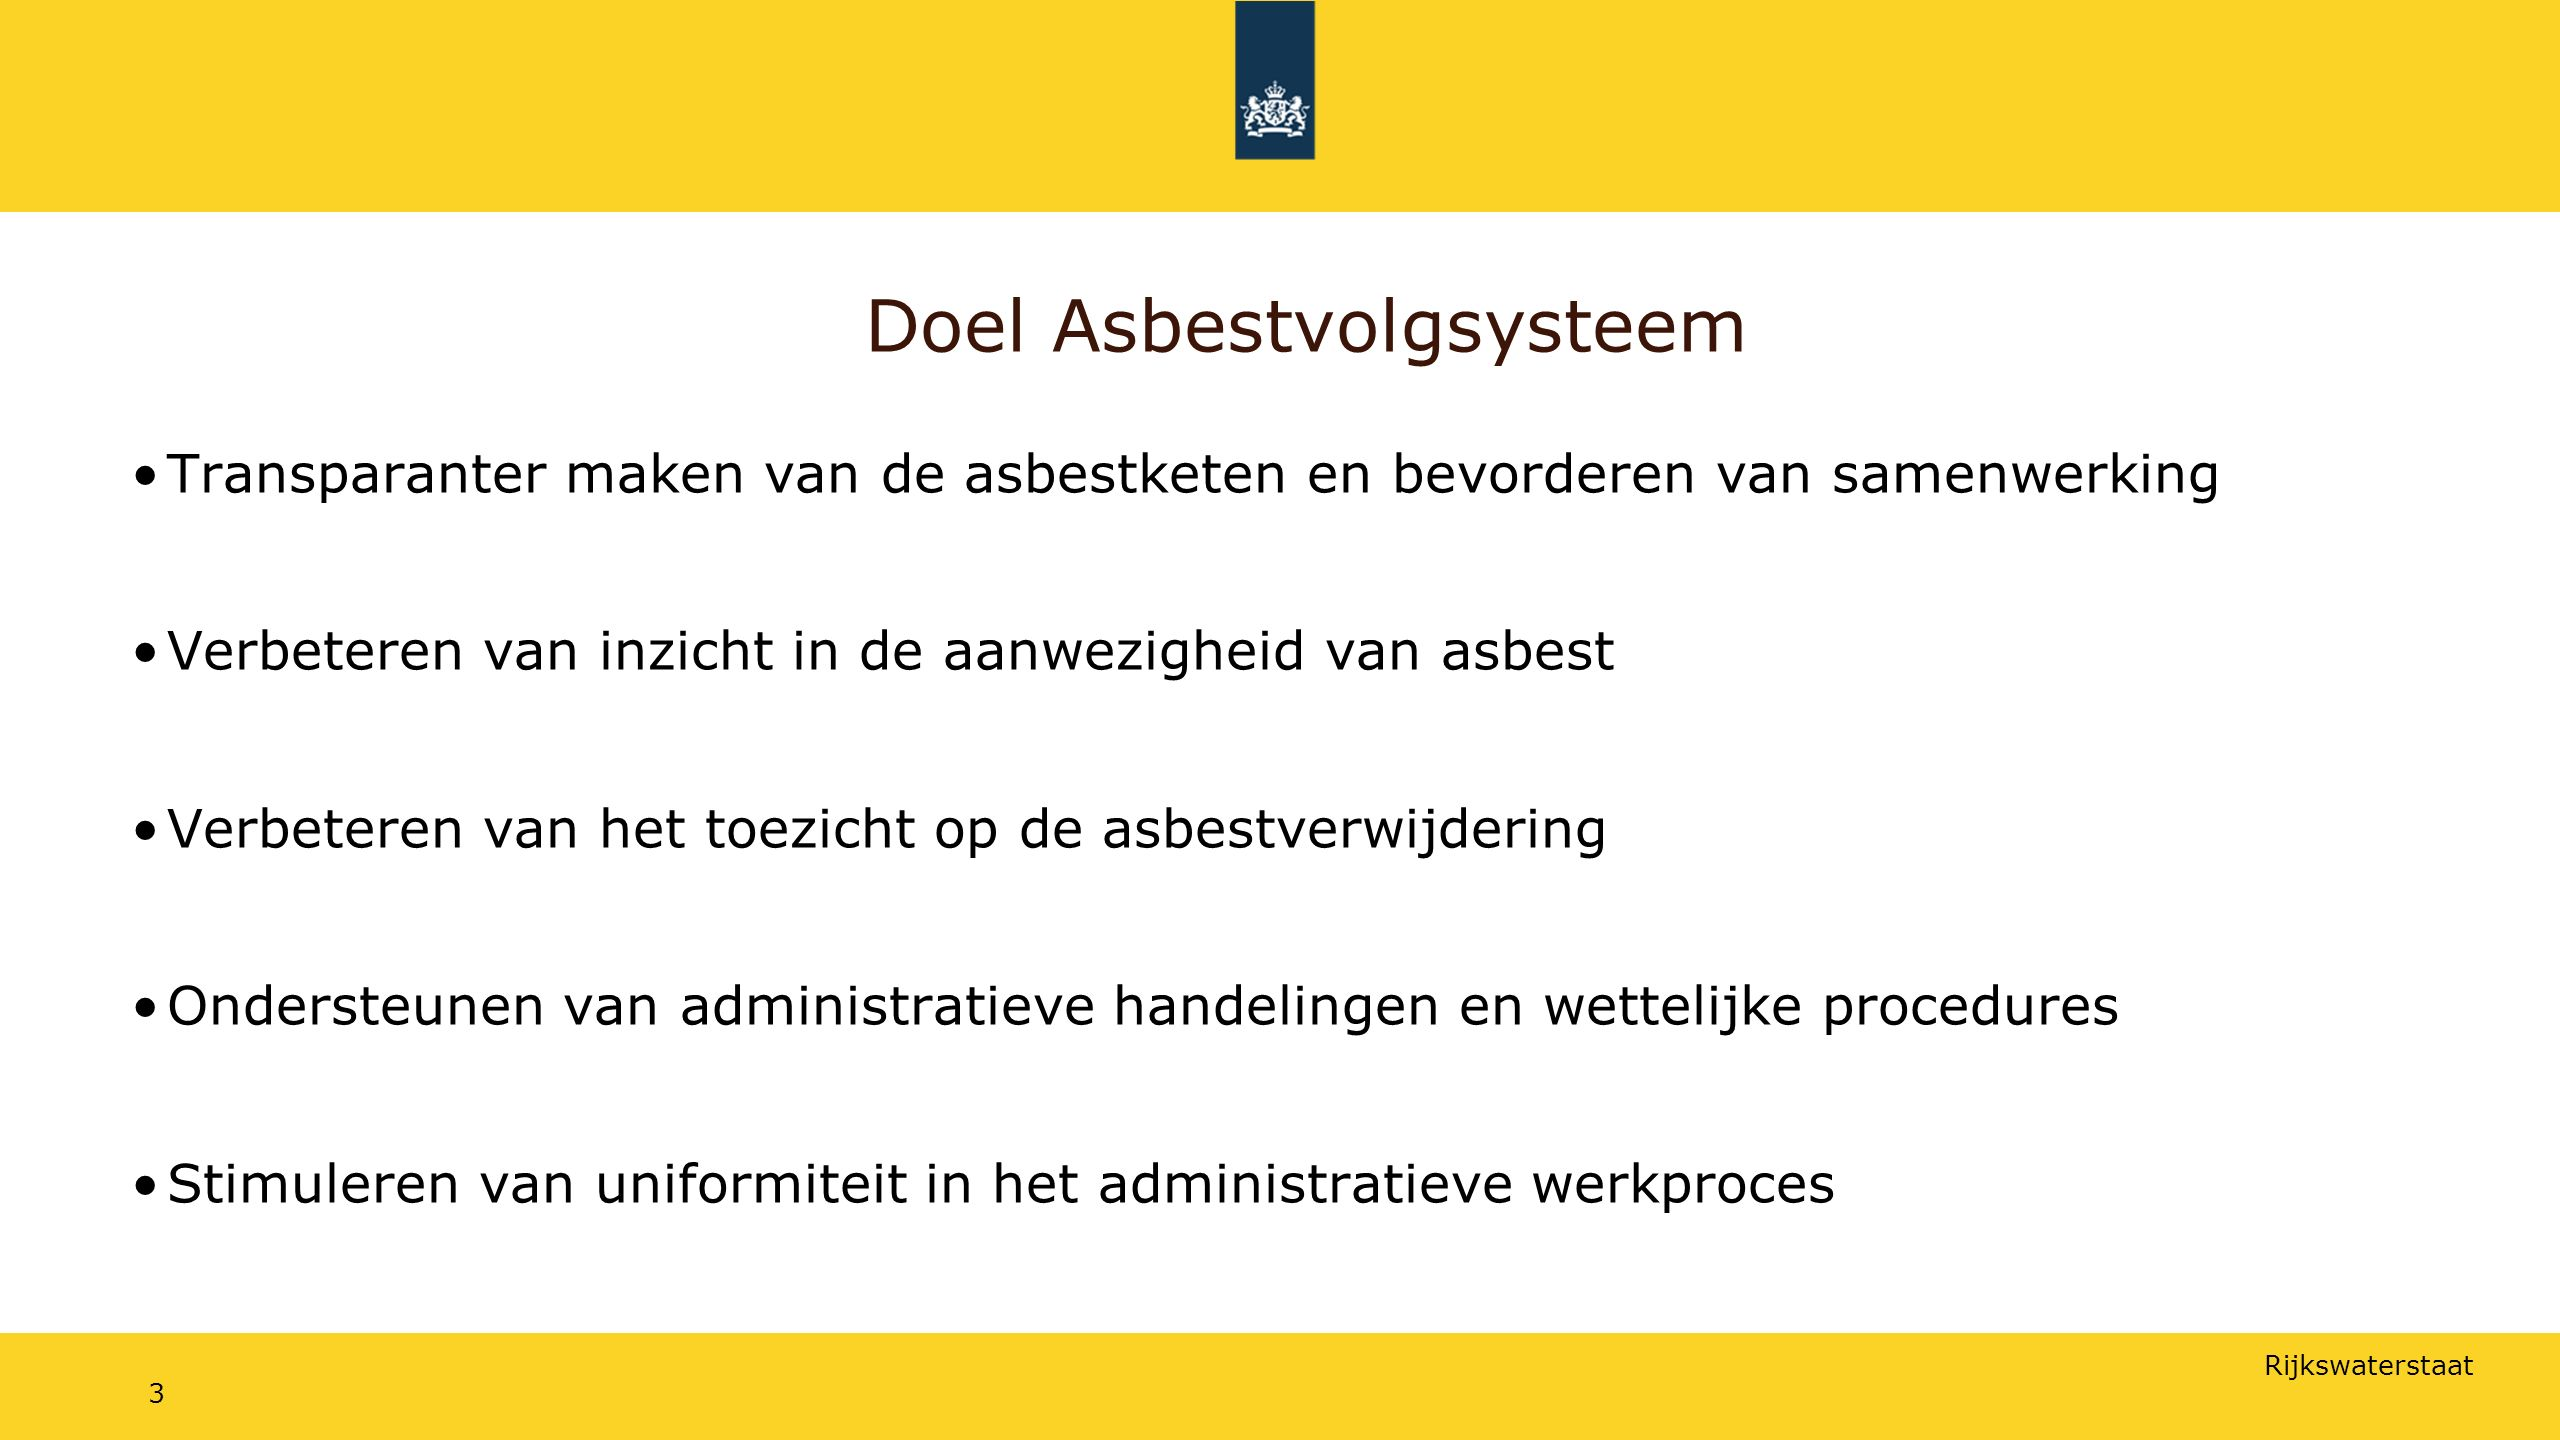 Doel Asbestvolgsysteem